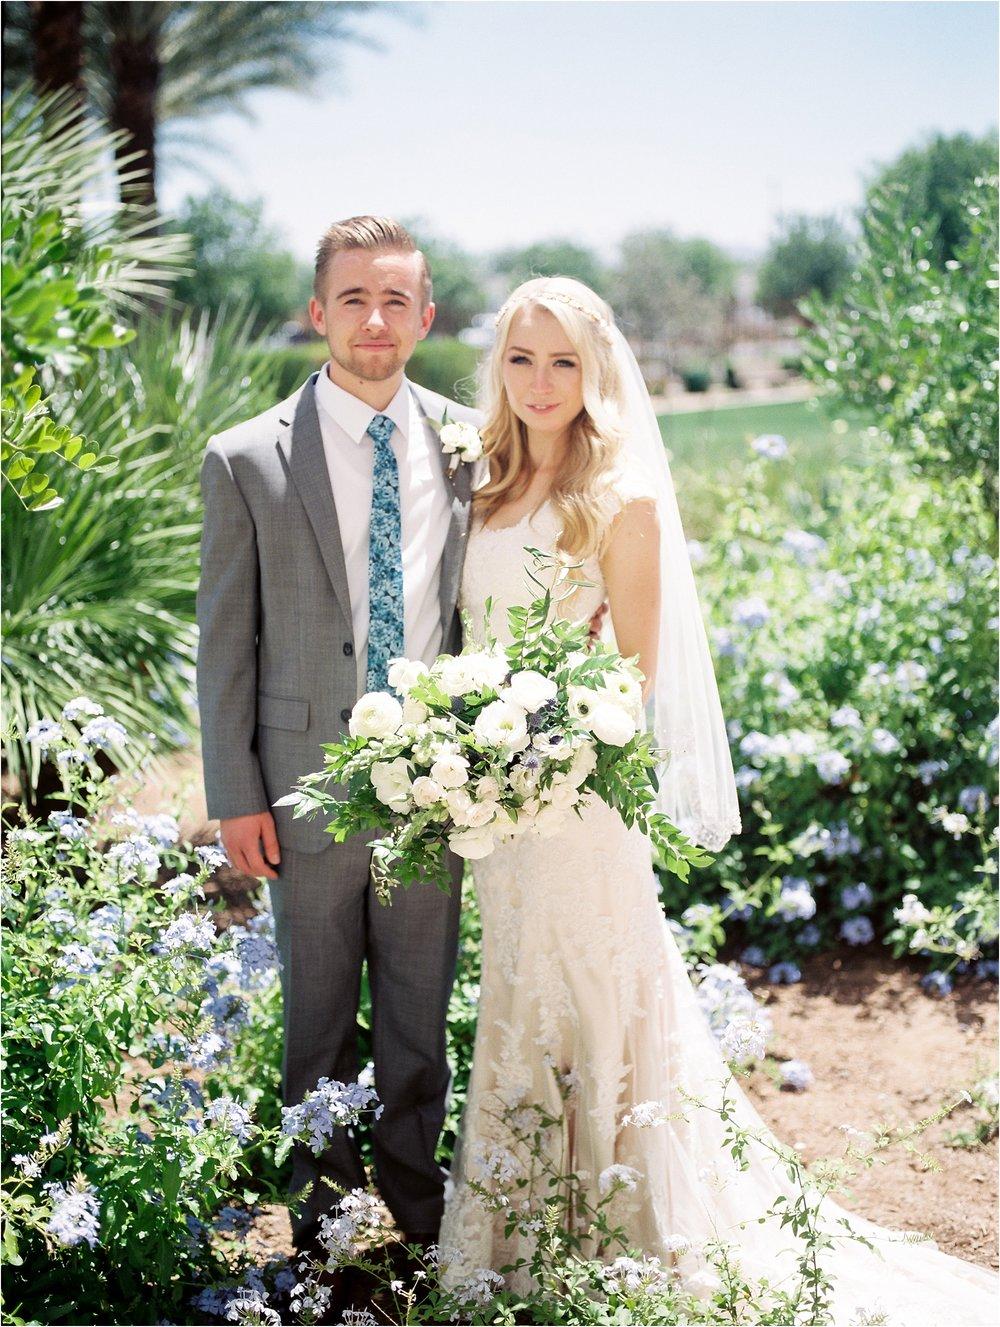 Sarah Jane Photography Film Hybrid Scottsdale Phoenix Arizona Destination Wedding Photographer Julie ans Mason_0024.jpg